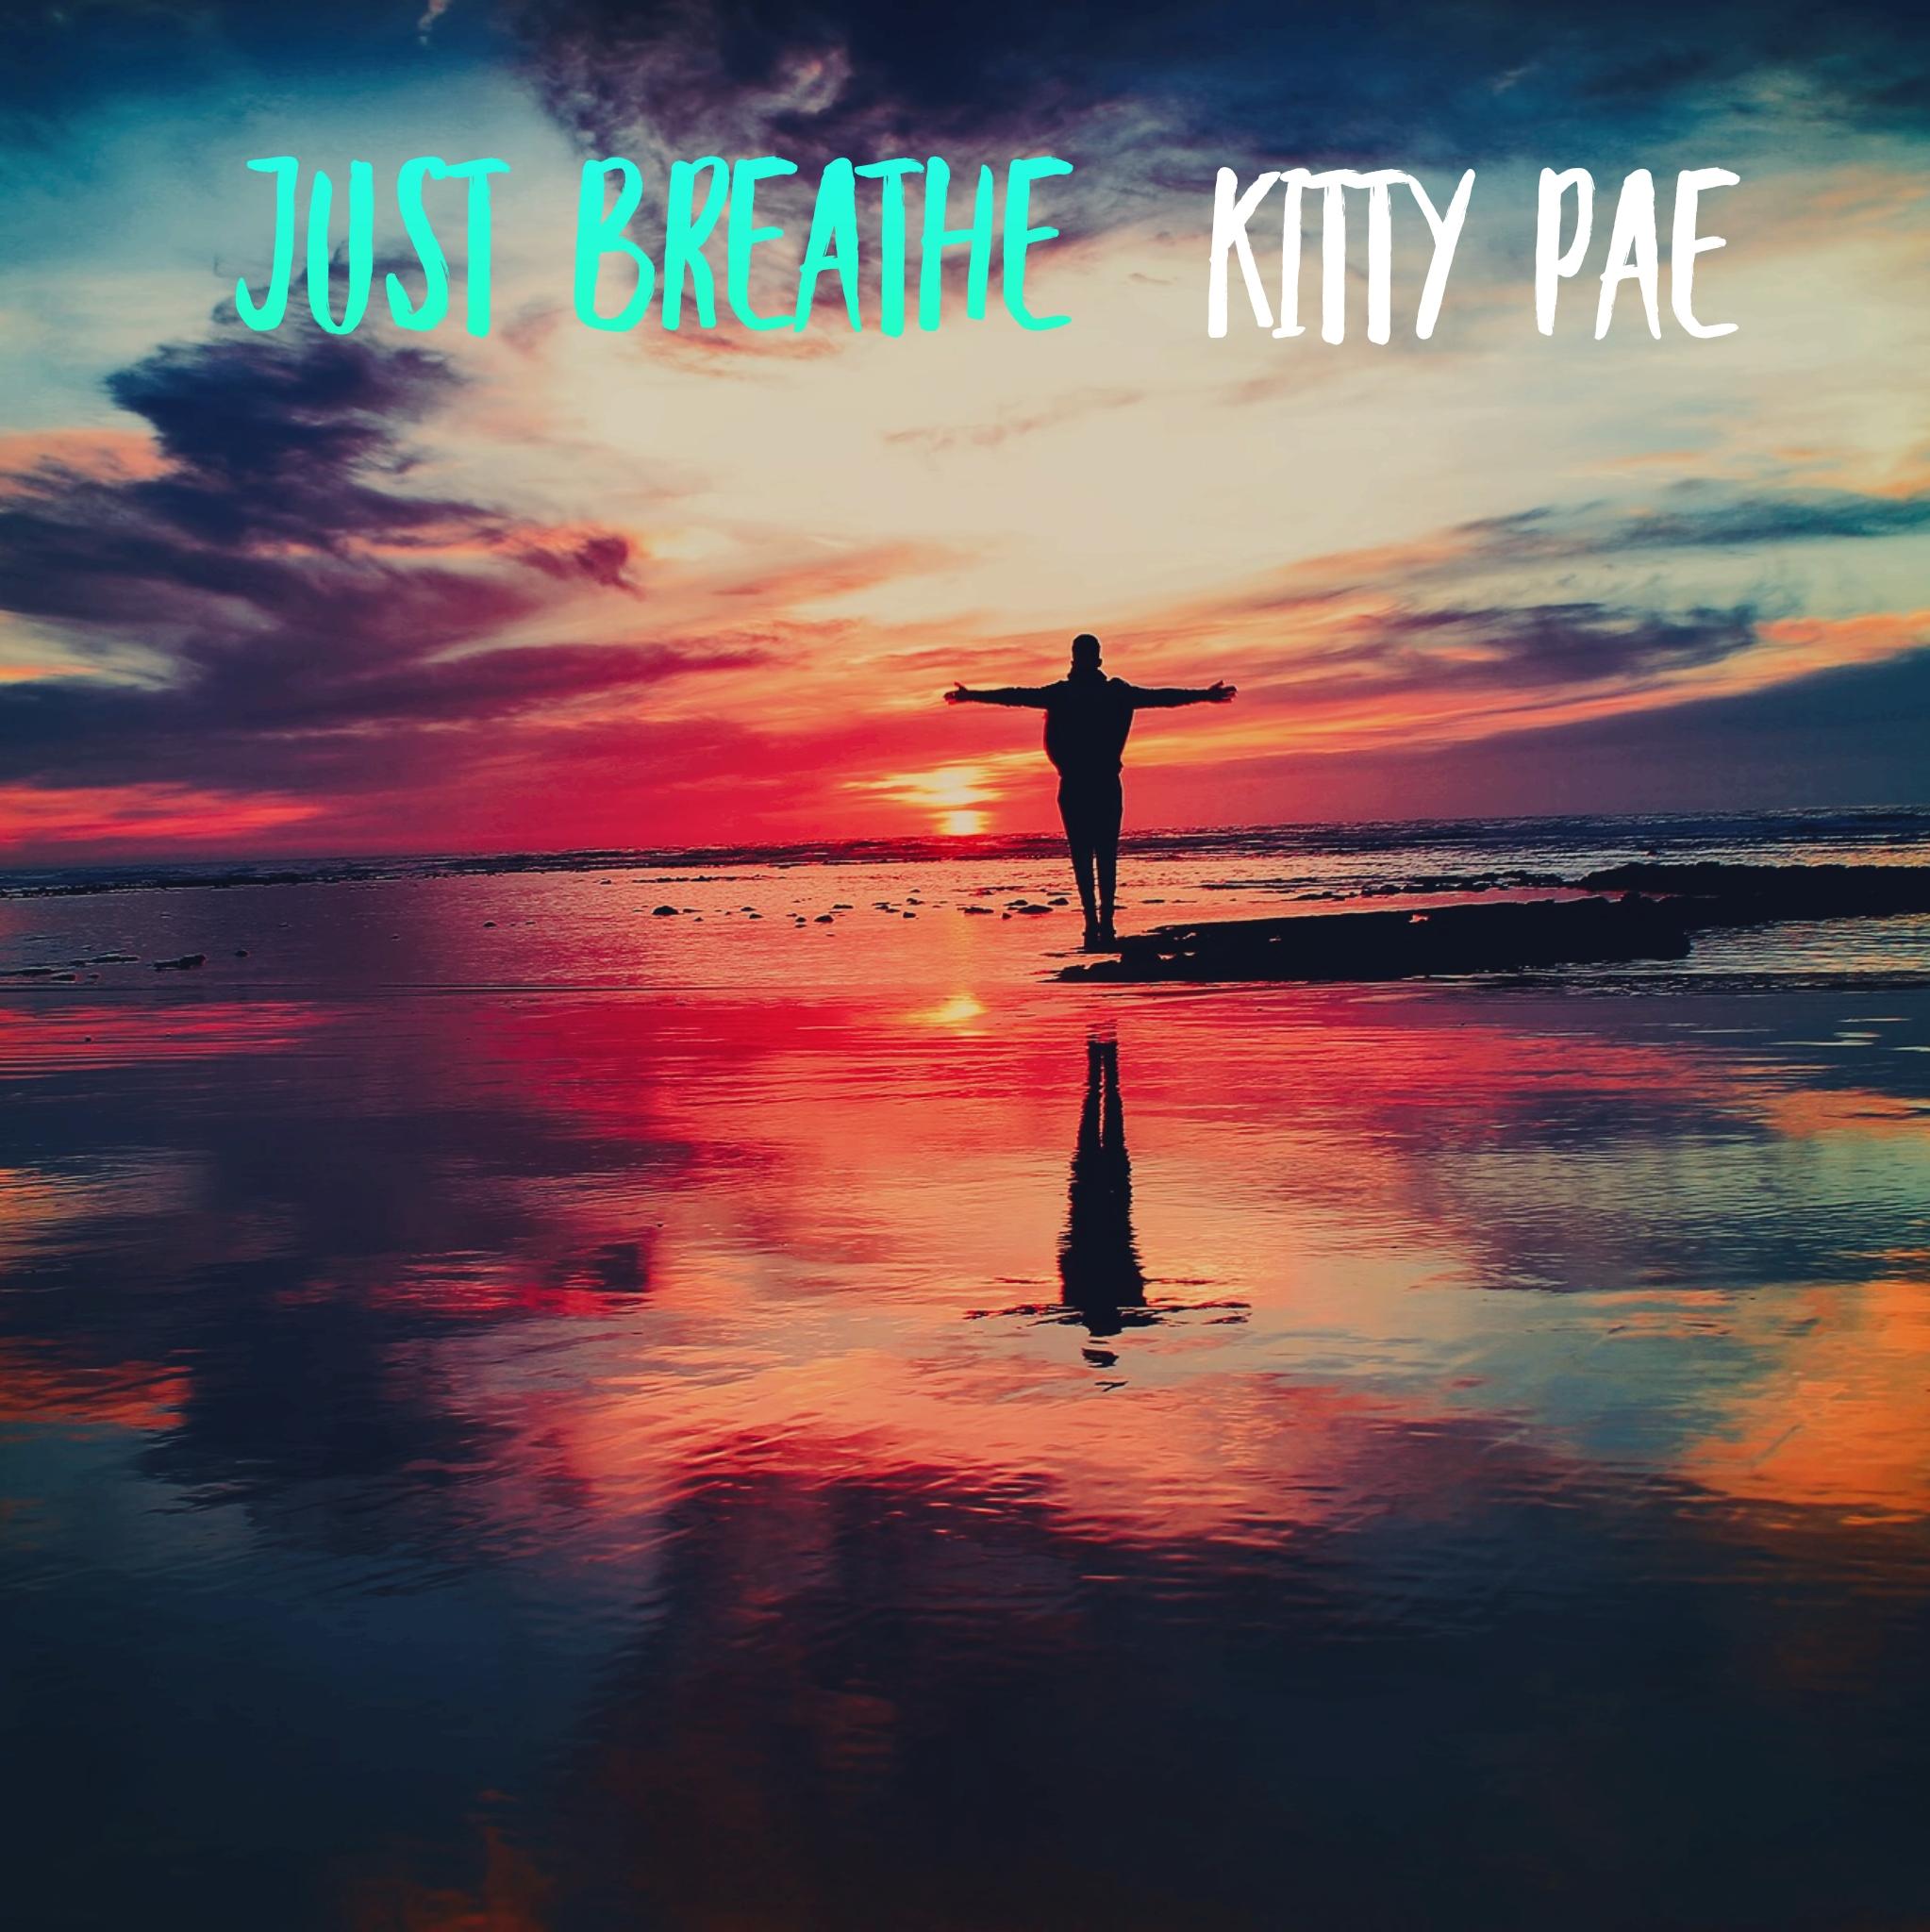 Just Breathe - Single